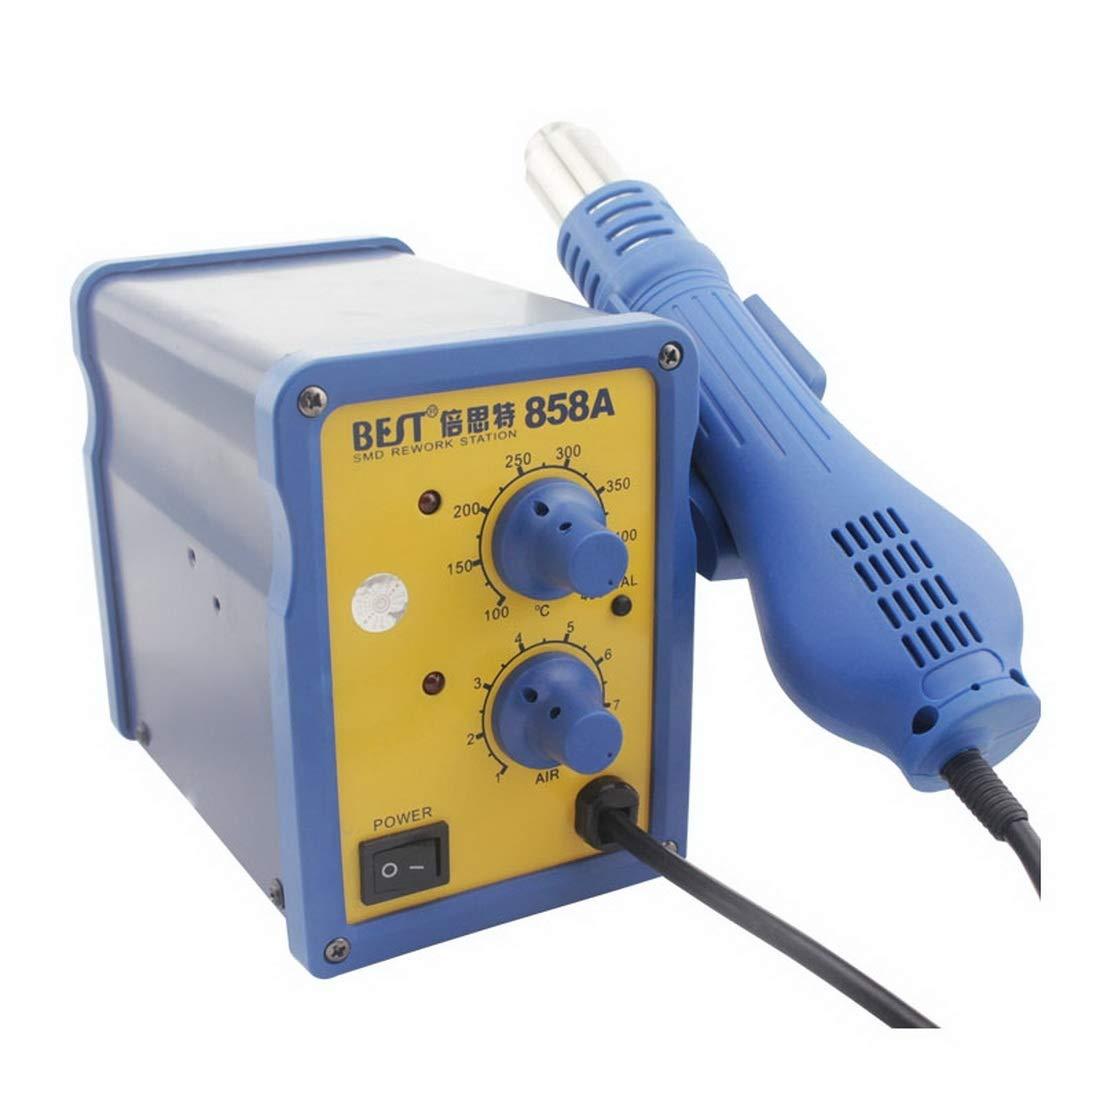 Toos Accessory BST-858A AC 220V 50Hz 650W Adjustable Temperature Unleaded Hot Air Gun with Helical Wind, EU Plug Hand Tools (Color : S-etp-0241a)